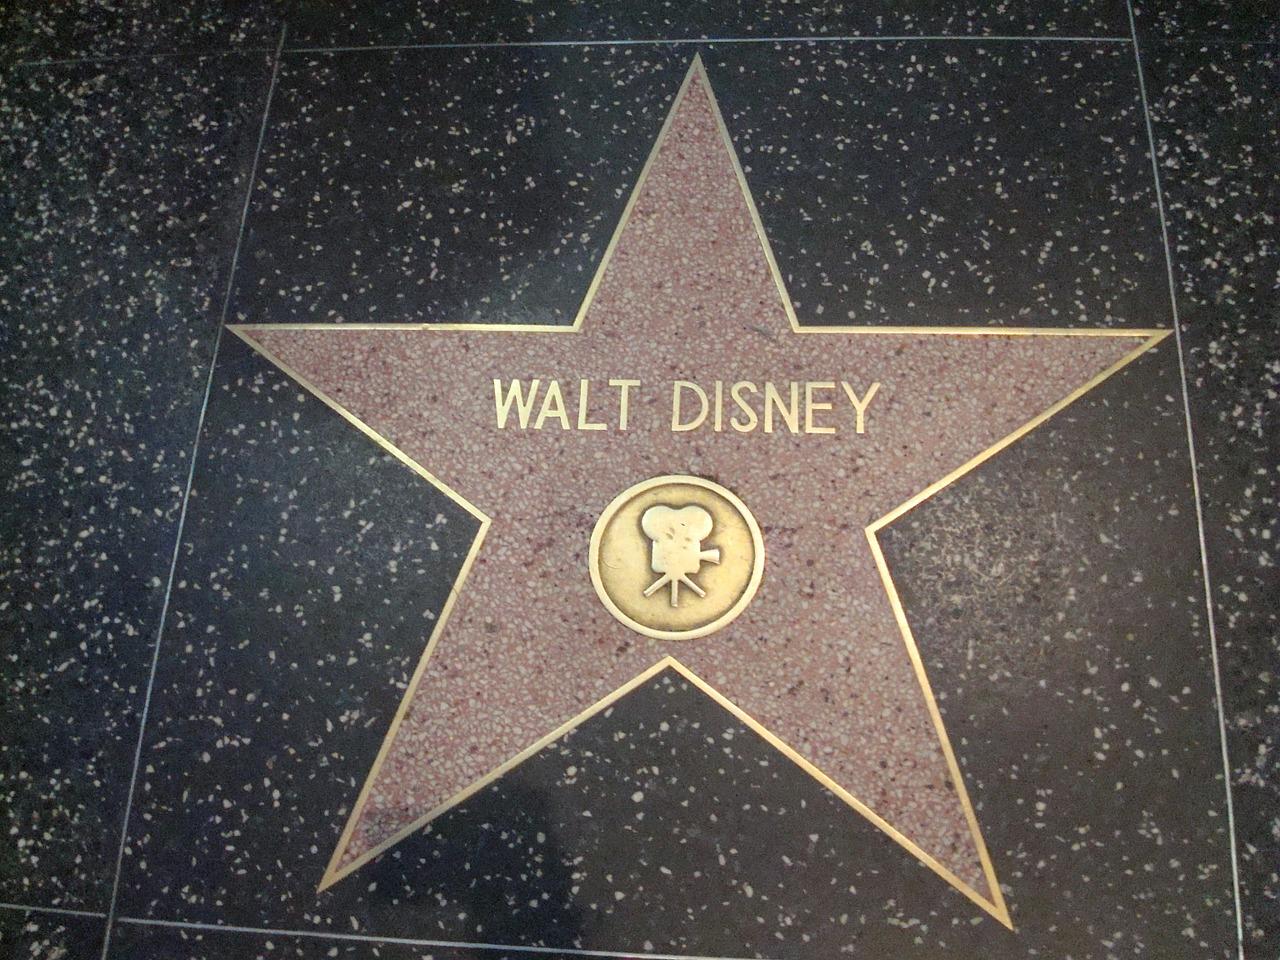 Walt Disney at Hollywood, California